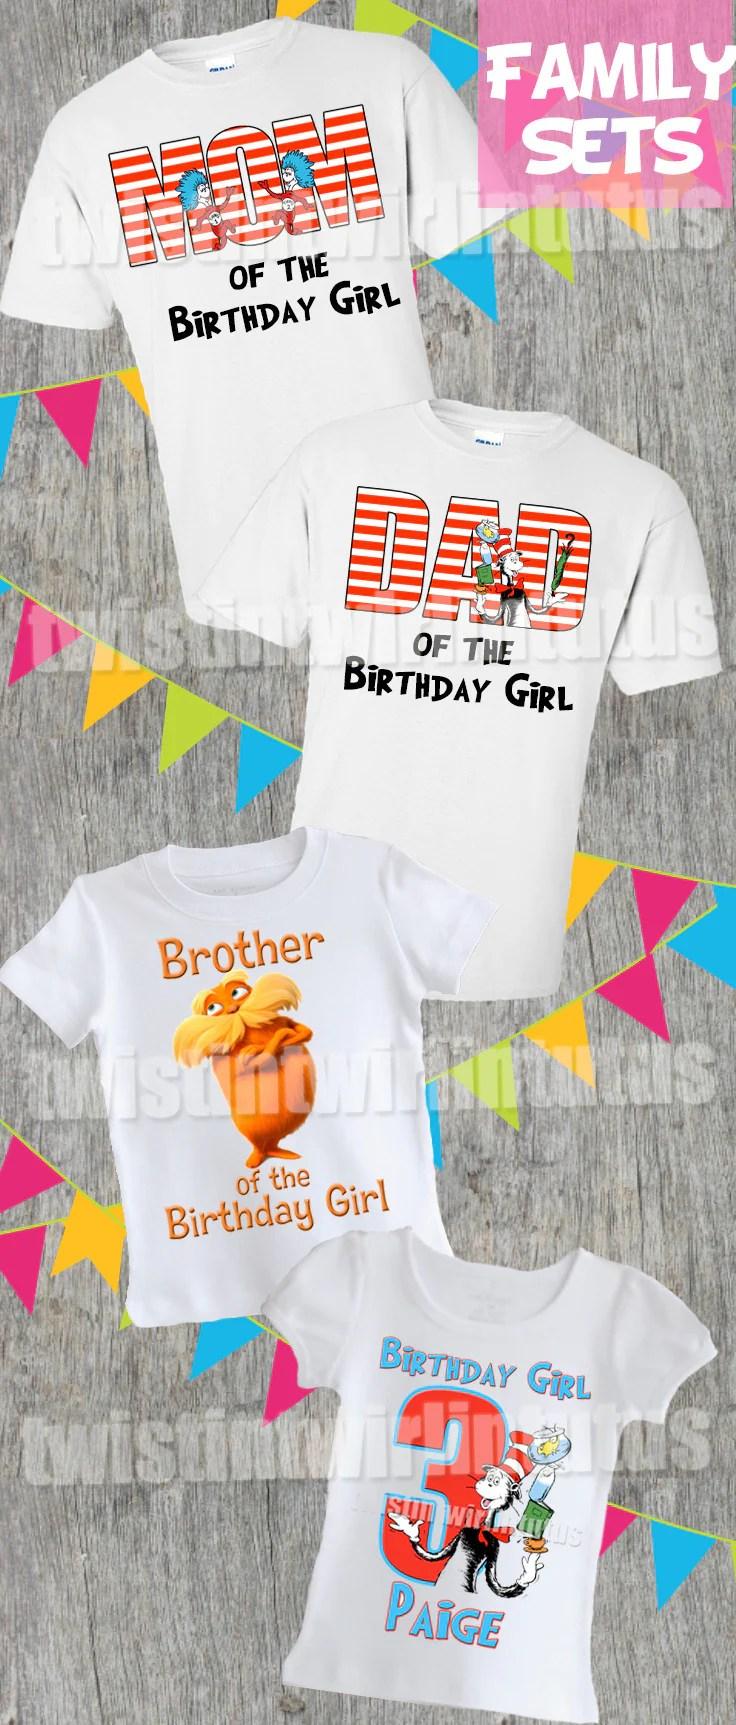 Cat In The Hat Birthday Shirt Family Set Twistin Twirlin Tutus